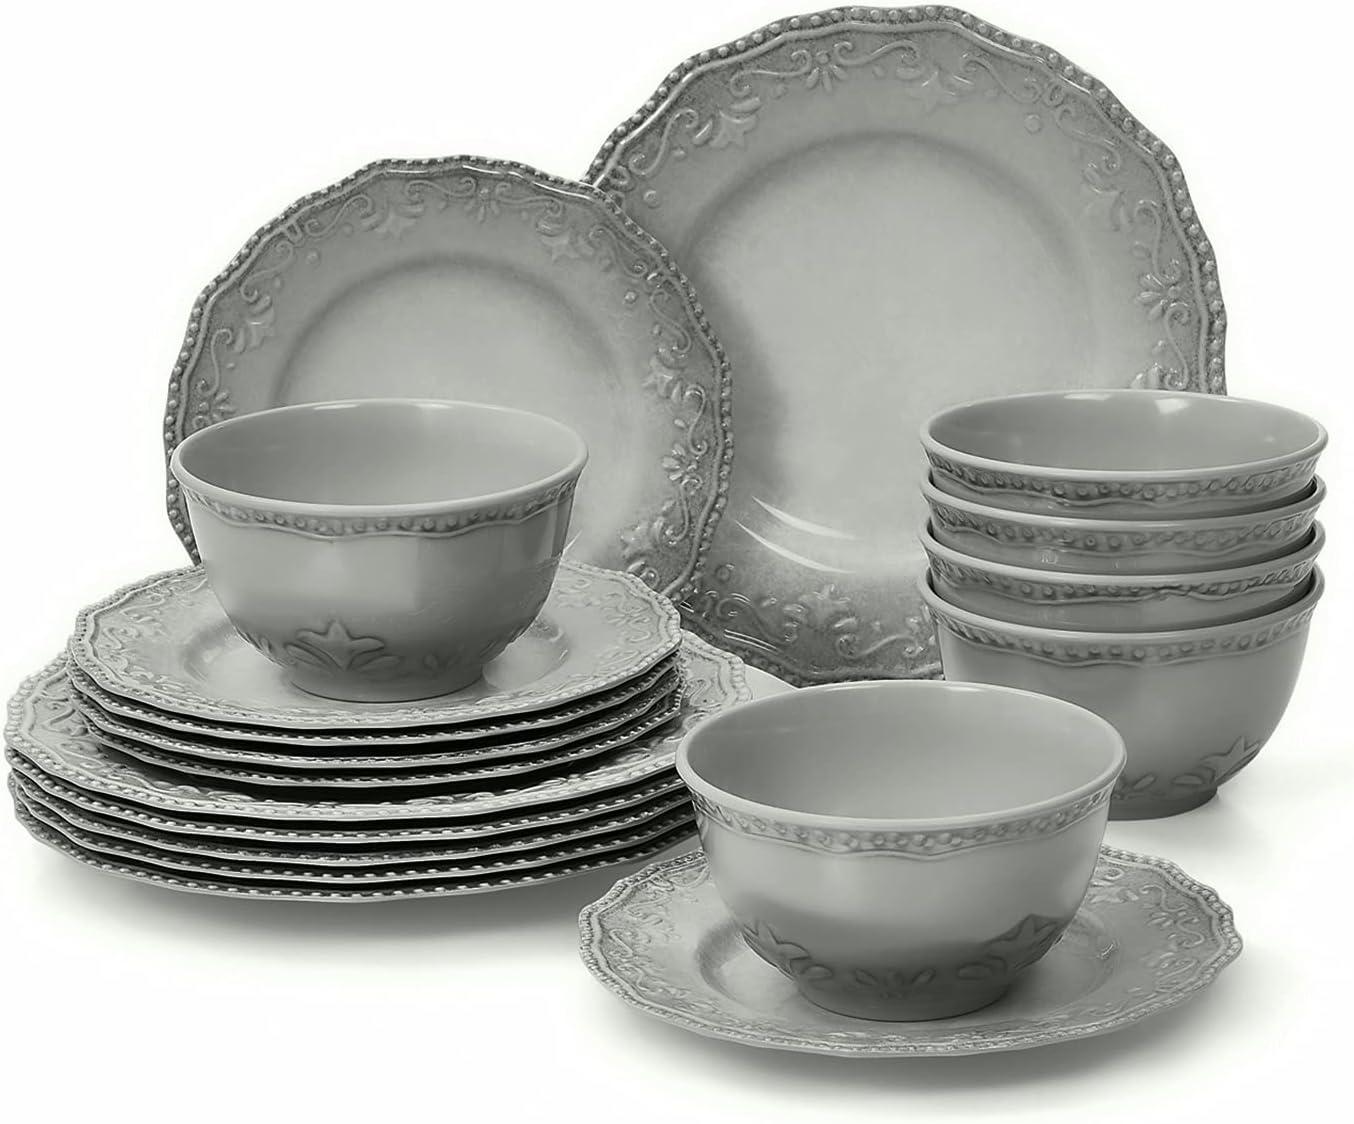 TP Dinnerware Set 18-Piece Dishes Service Cheap super special price Dinner Melamine Phoenix Mall